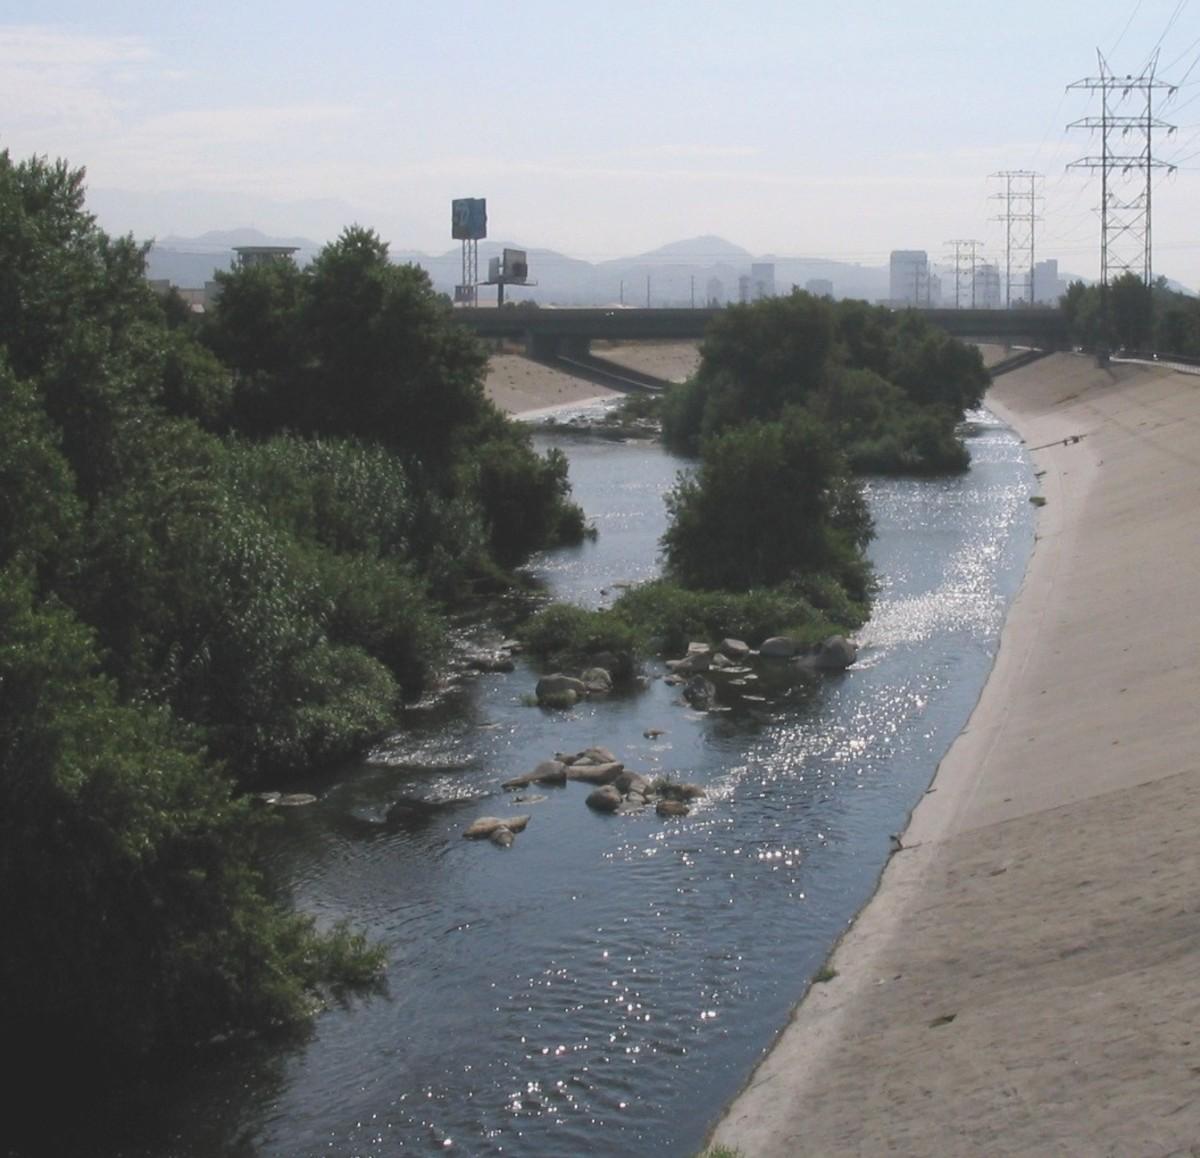 Los Angeles River in Glendale, Ca.